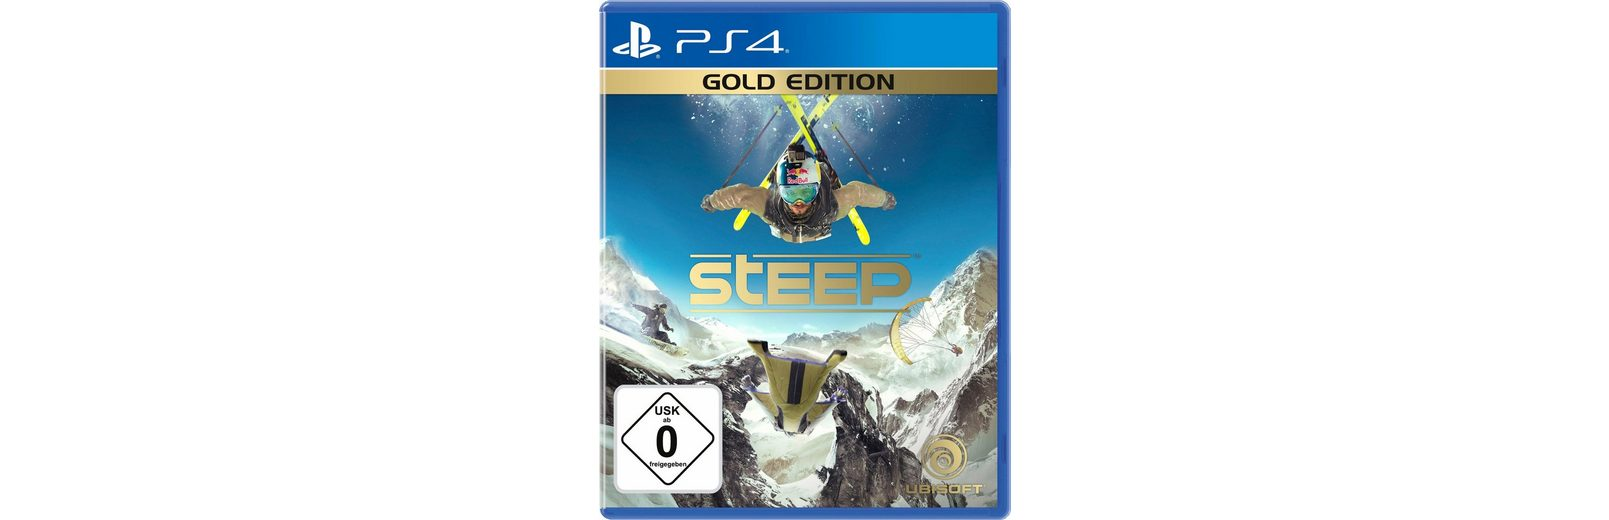 Steep Gold Edition PlayStation 4